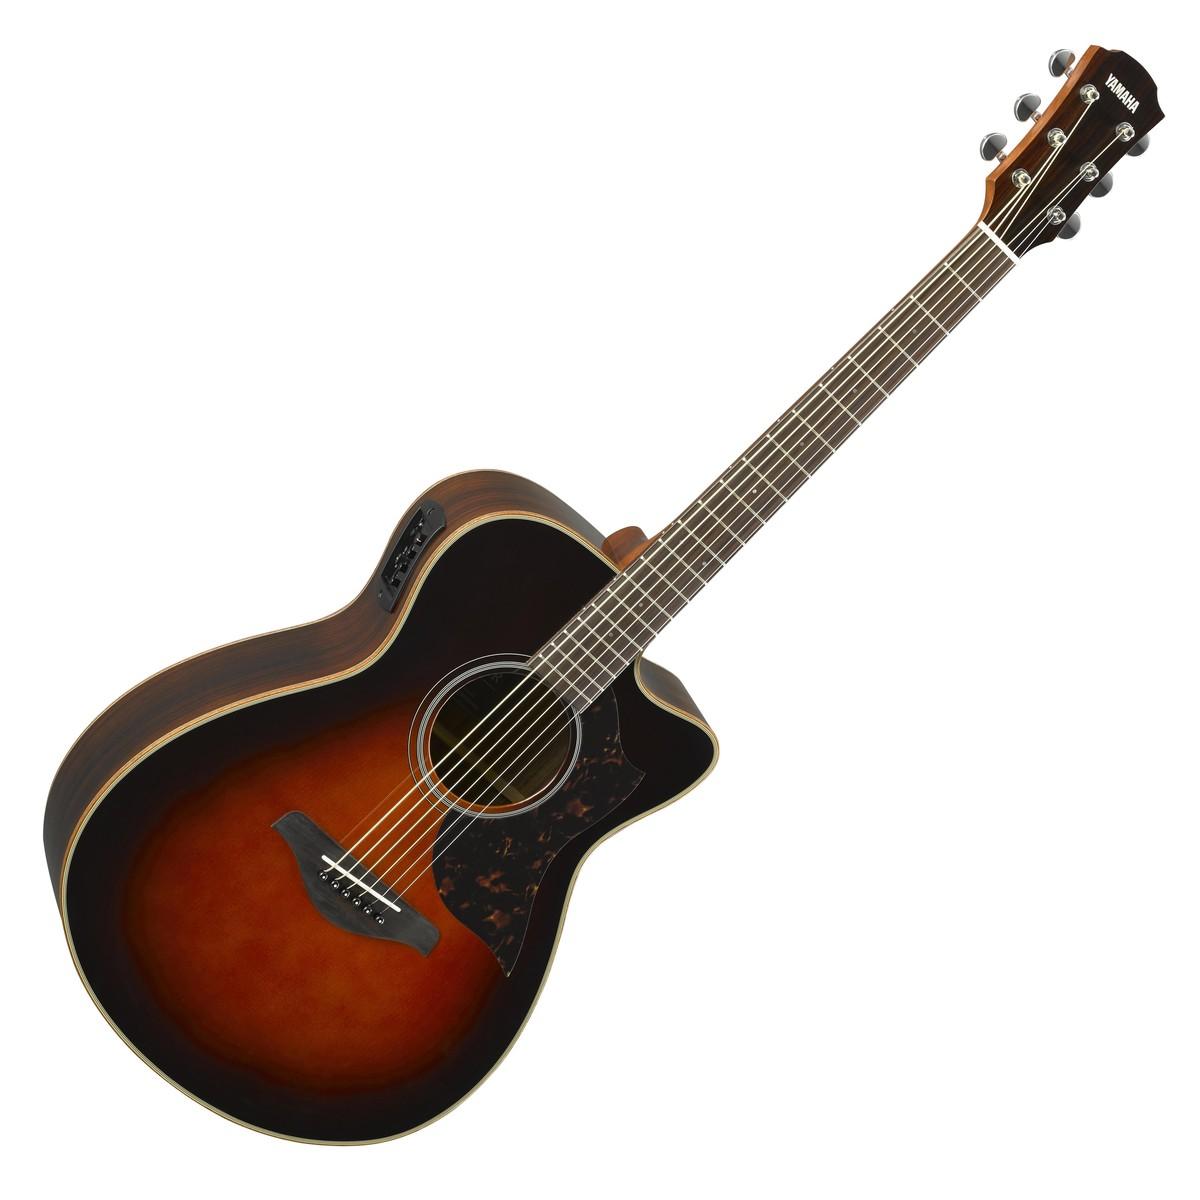 Yamaha ac1r rosewood electro acoustic guitar tobacco for Acoustic yamaha guitar